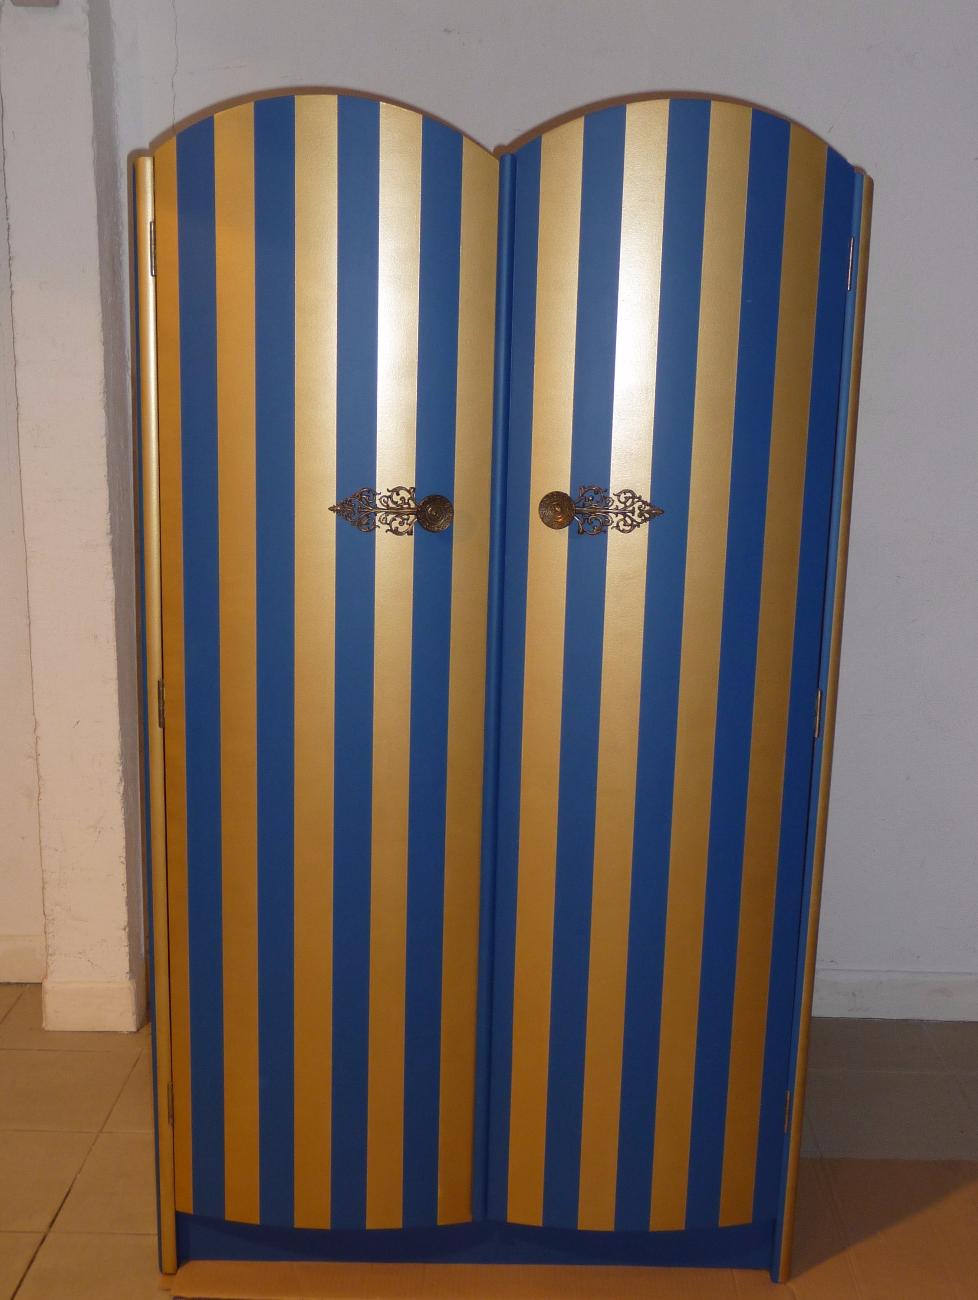 armoire repeinte en rayures dorées